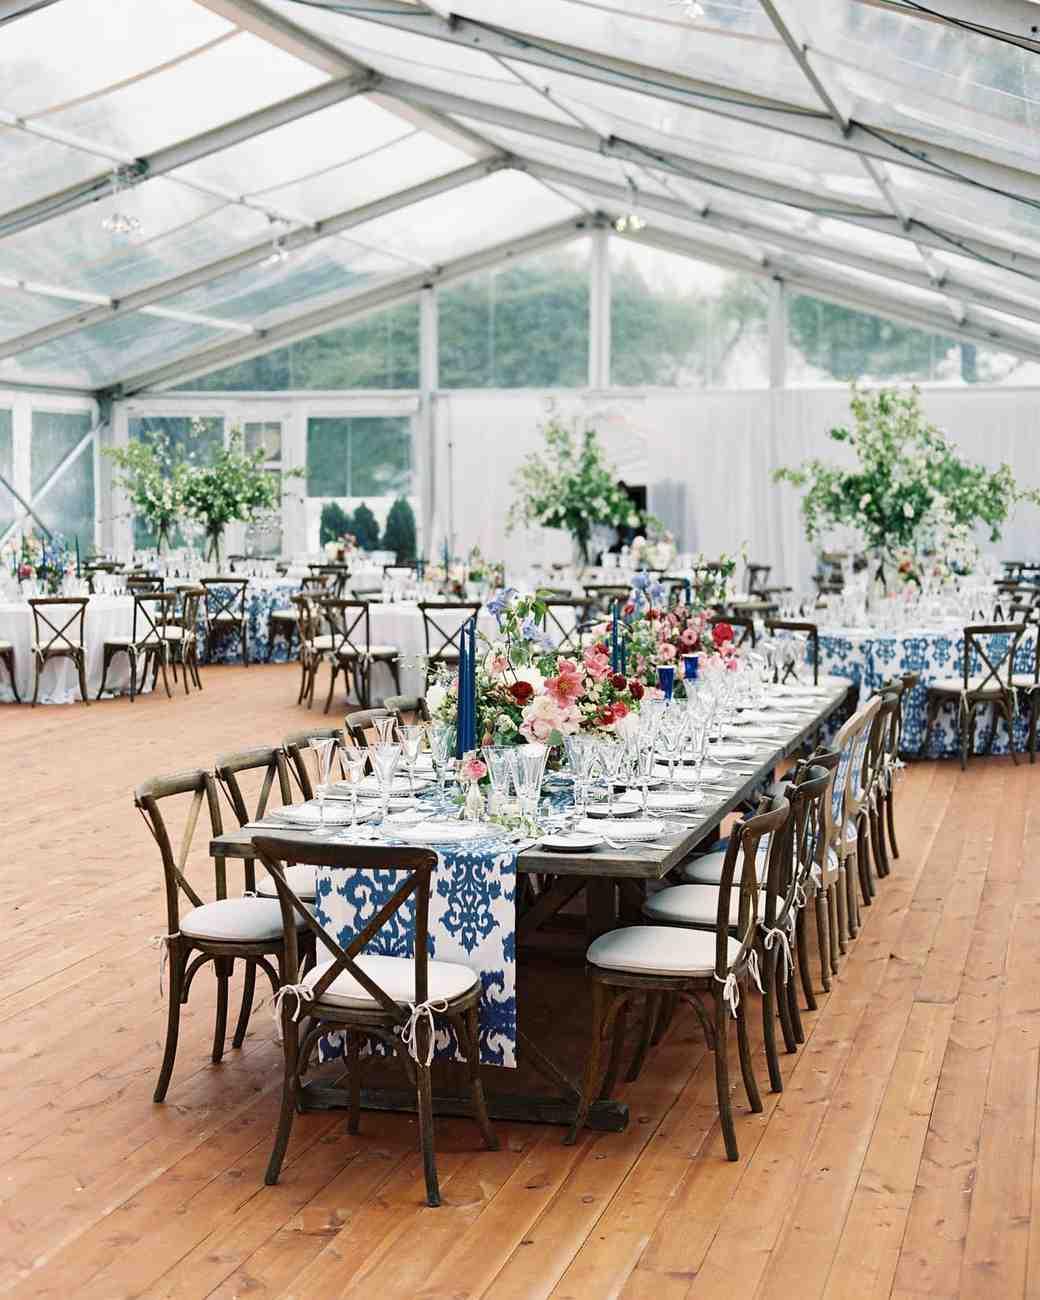 nikki-kiff-wedding-table-004753005-s112766-0316.jpg